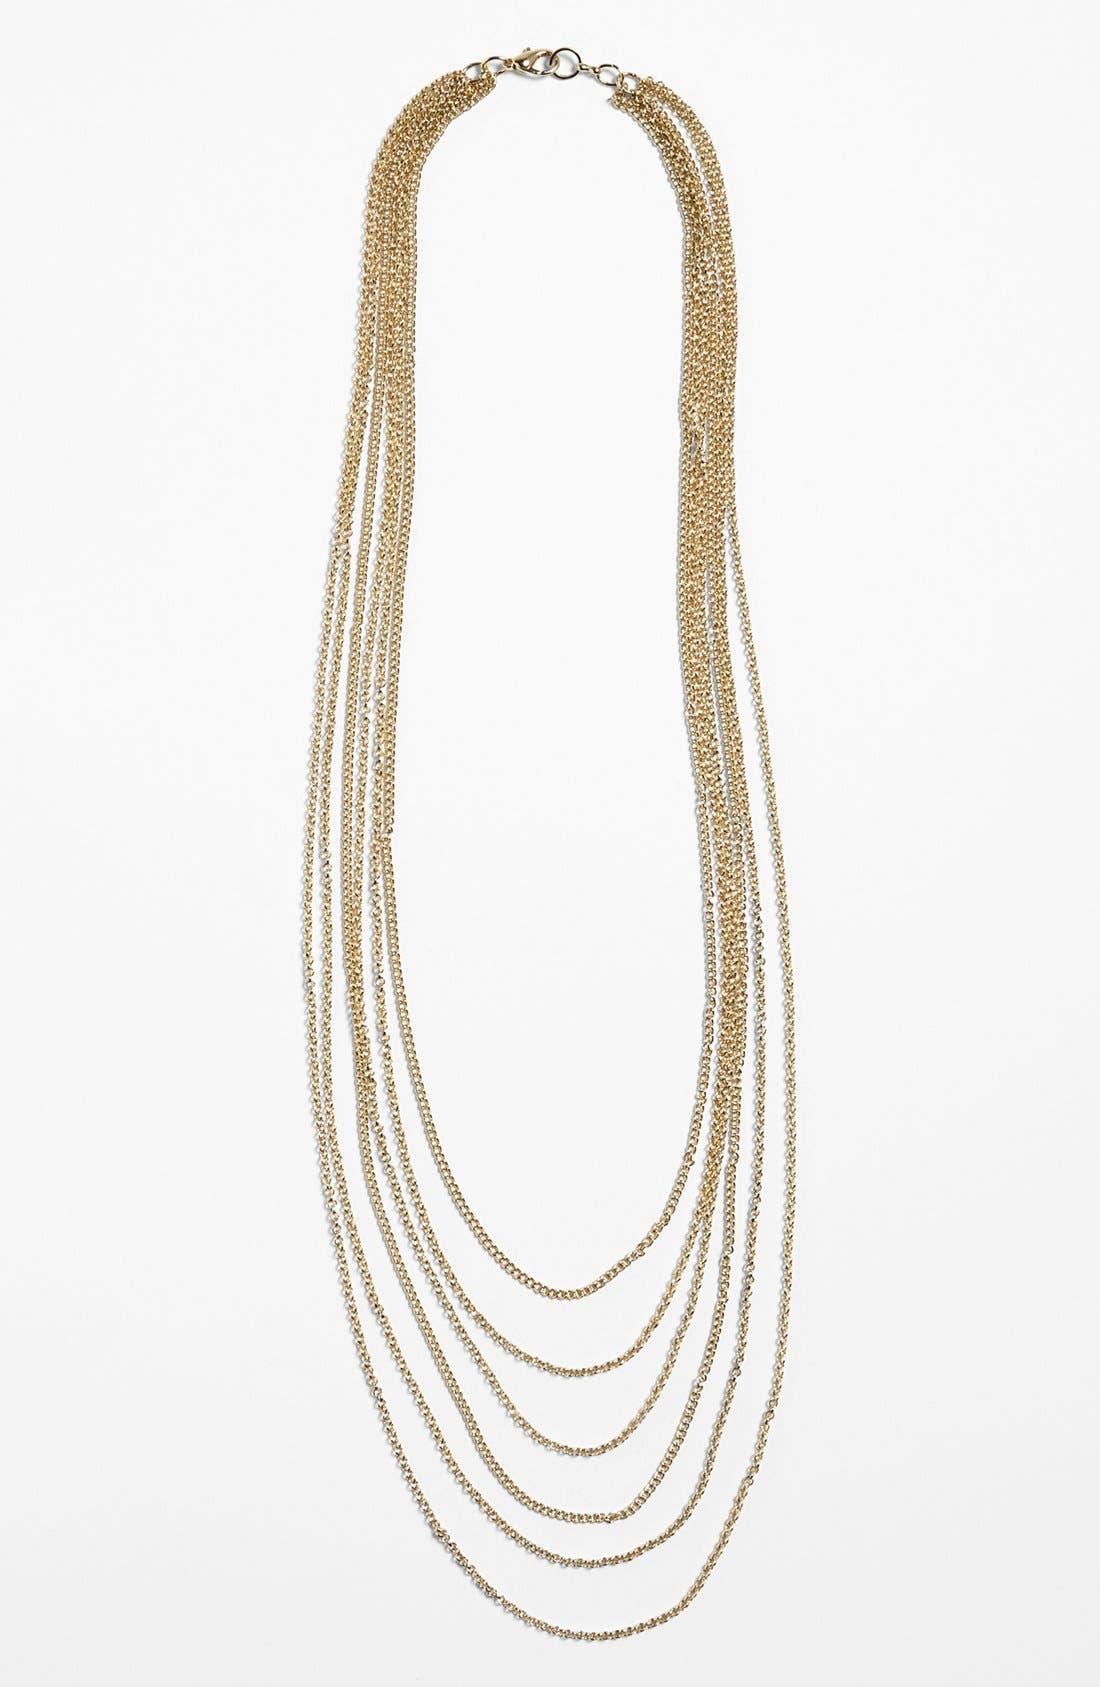 Alternate Image 1 Selected - Rachel Multistrand Chain Necklace (Juniors)